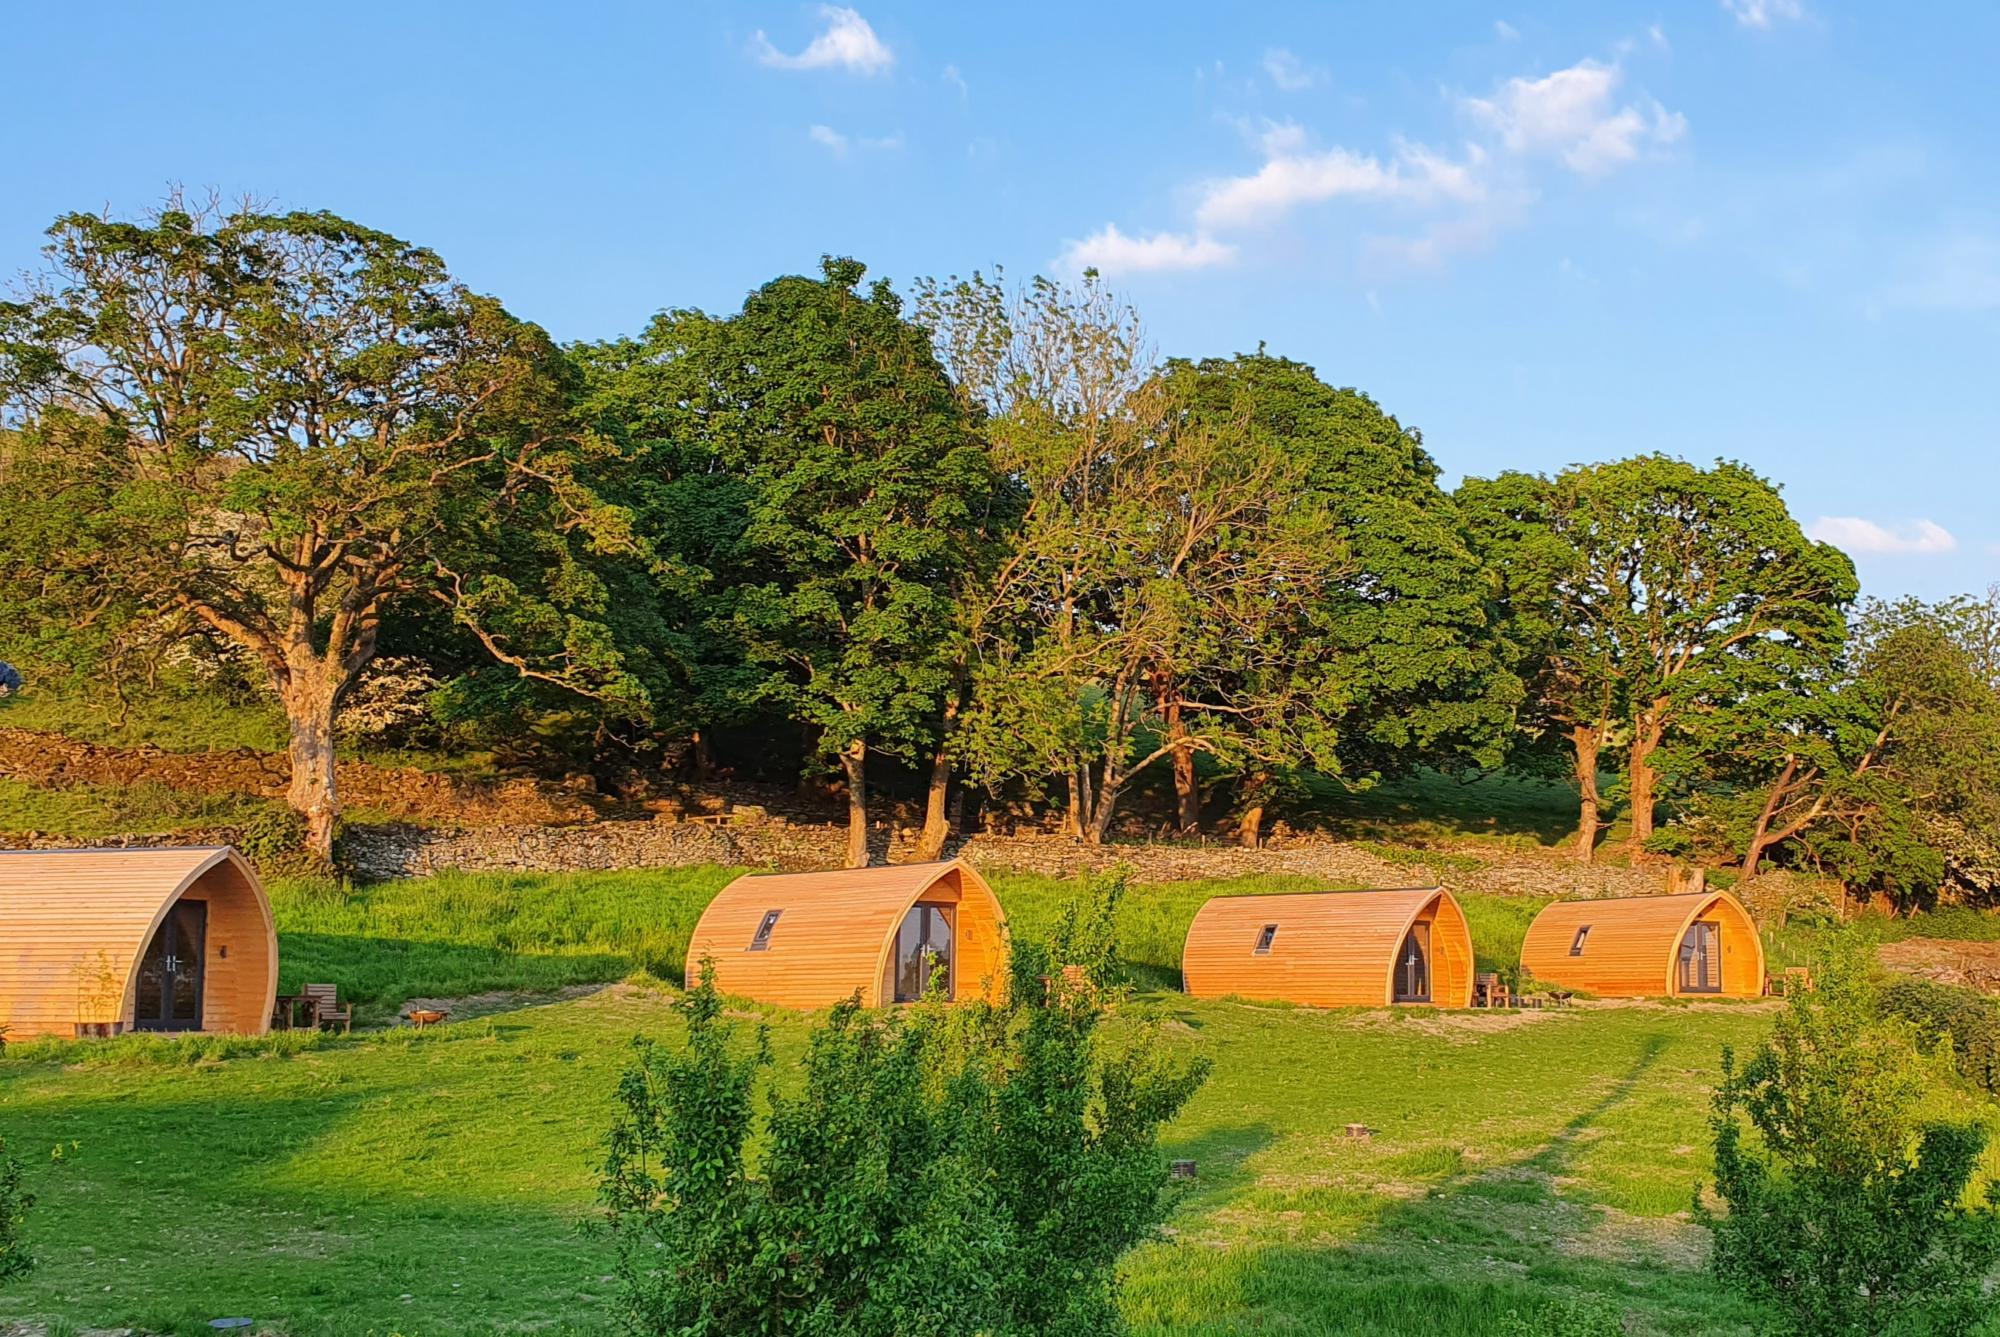 Campsites in Cumbria holidays at Cool Places